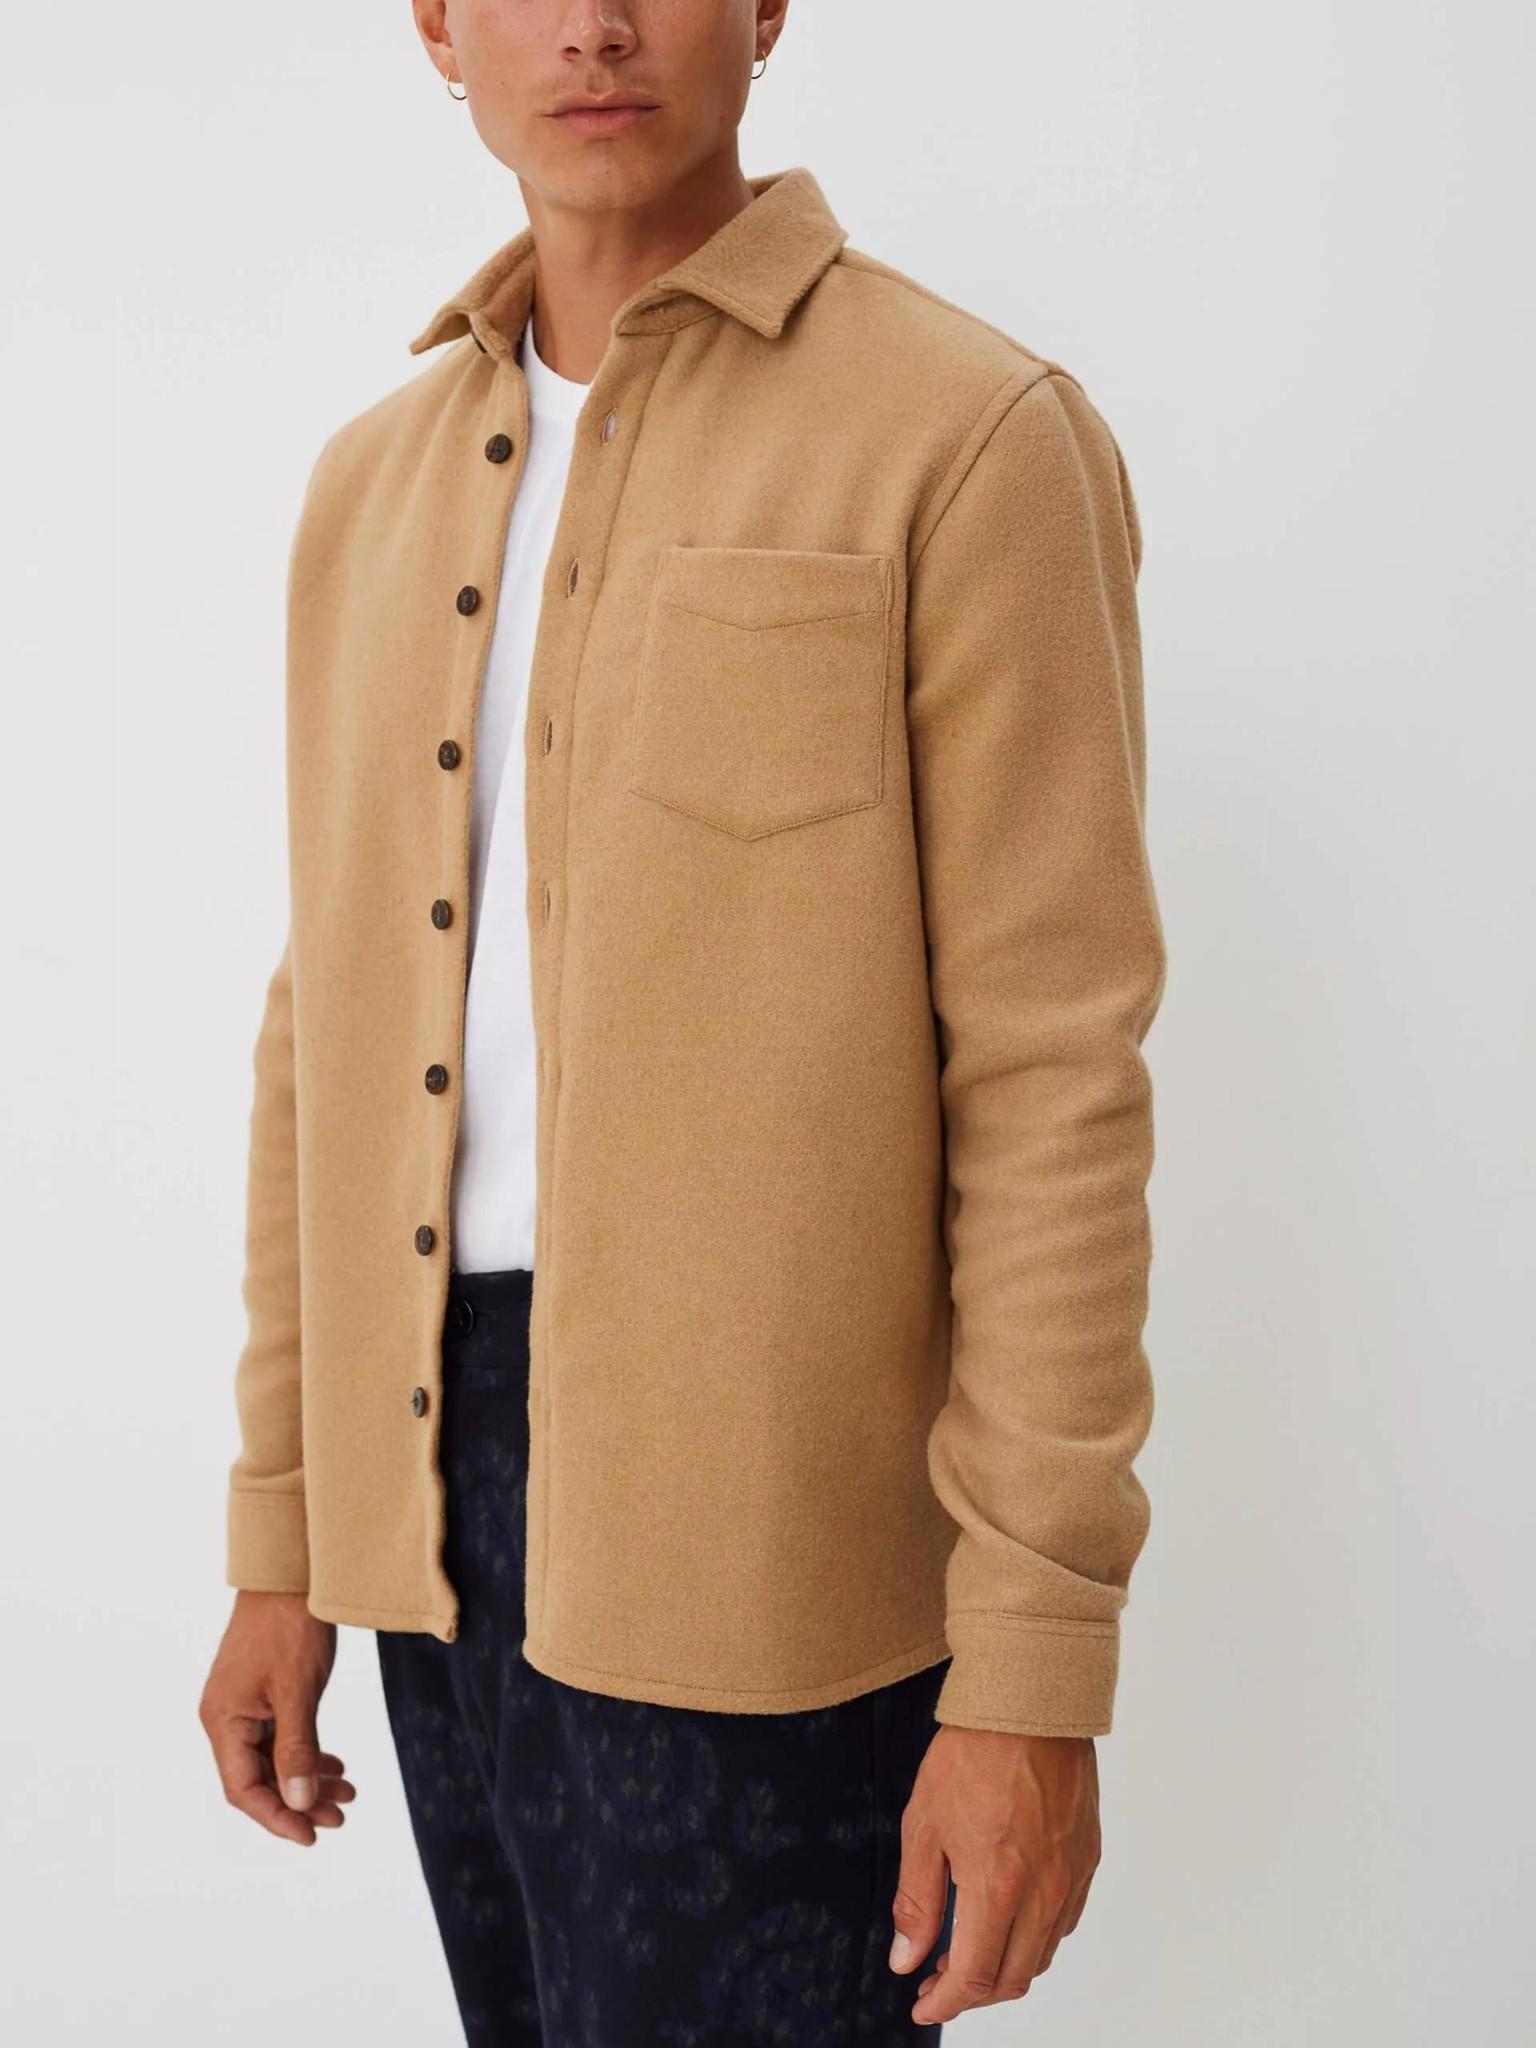 Miracle Khaki Wool Overshirt-2